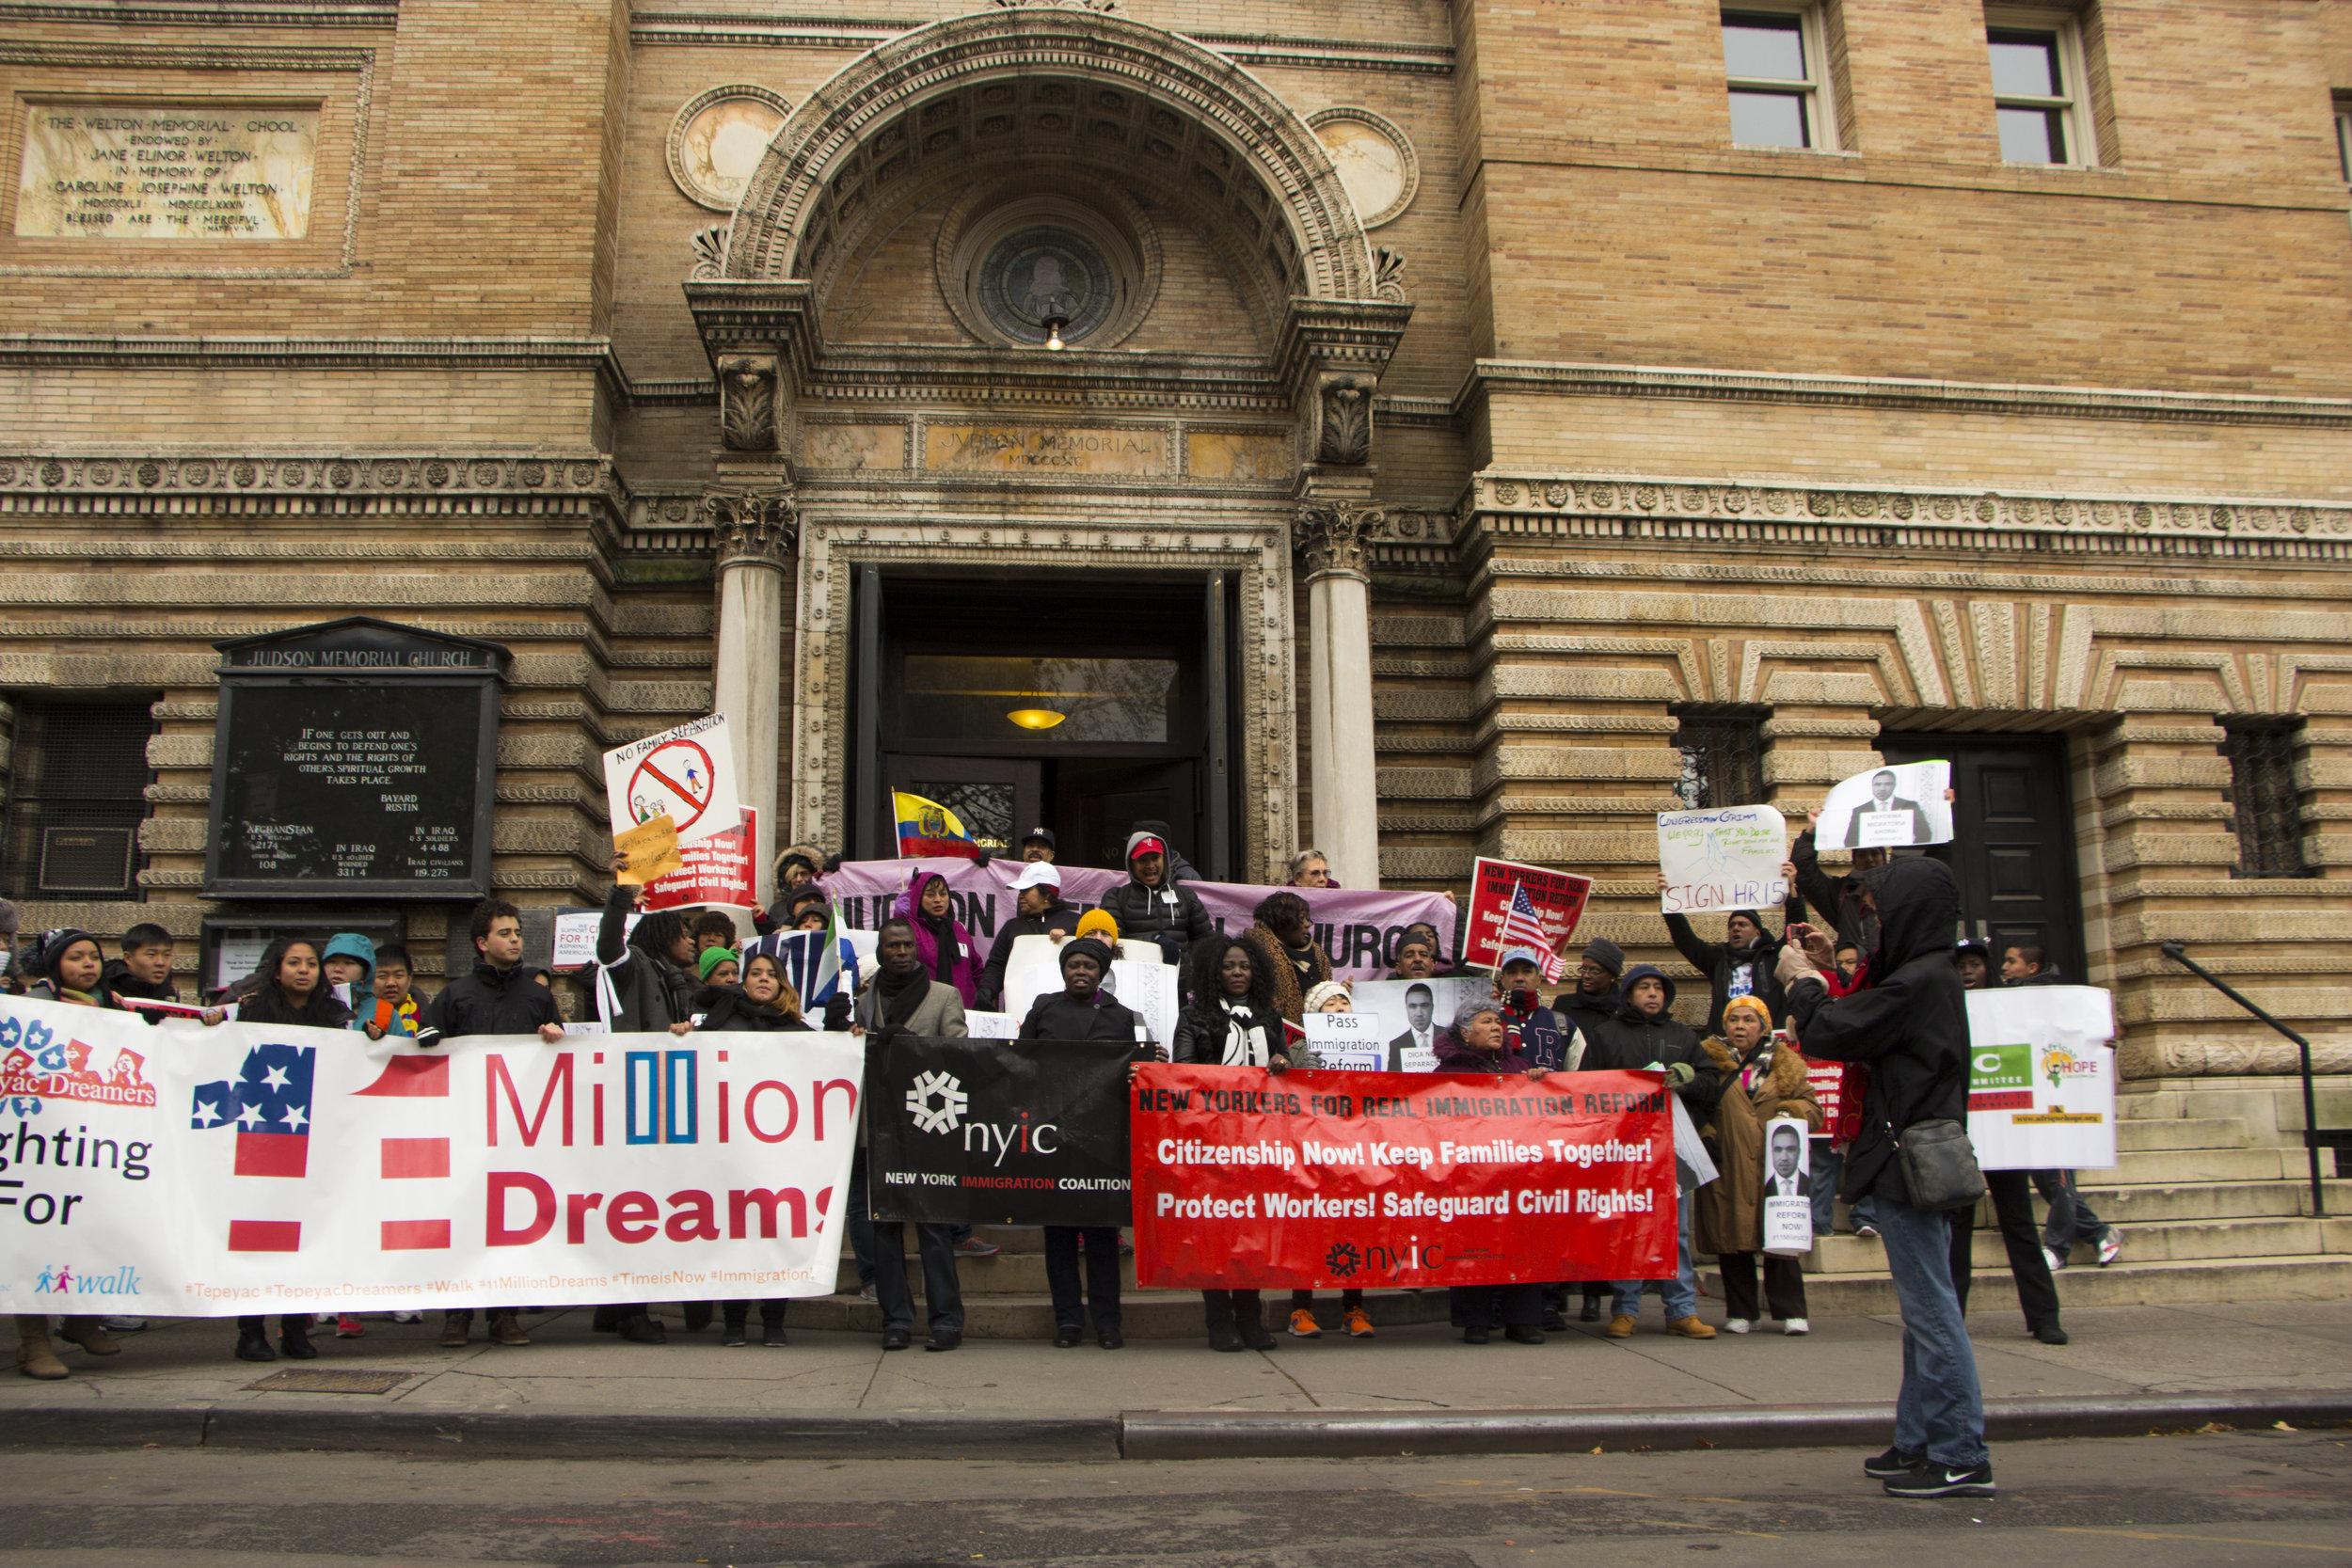 Immigration Reform Action11.12.13_7.JPG